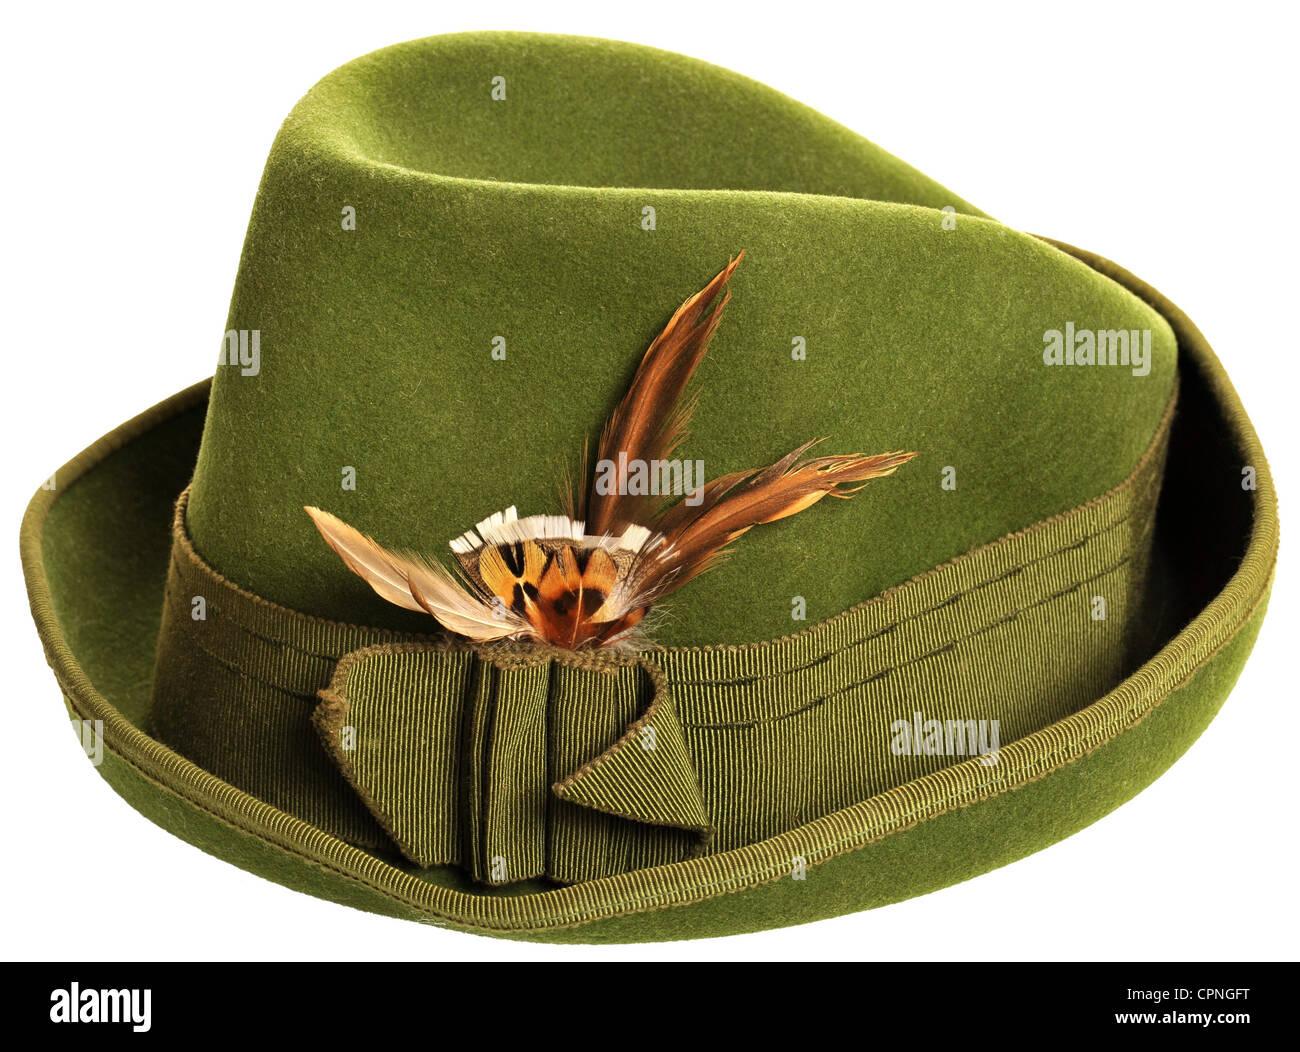 fashion, hat, made by: MM Mayser Milz 1833, Germany, circa